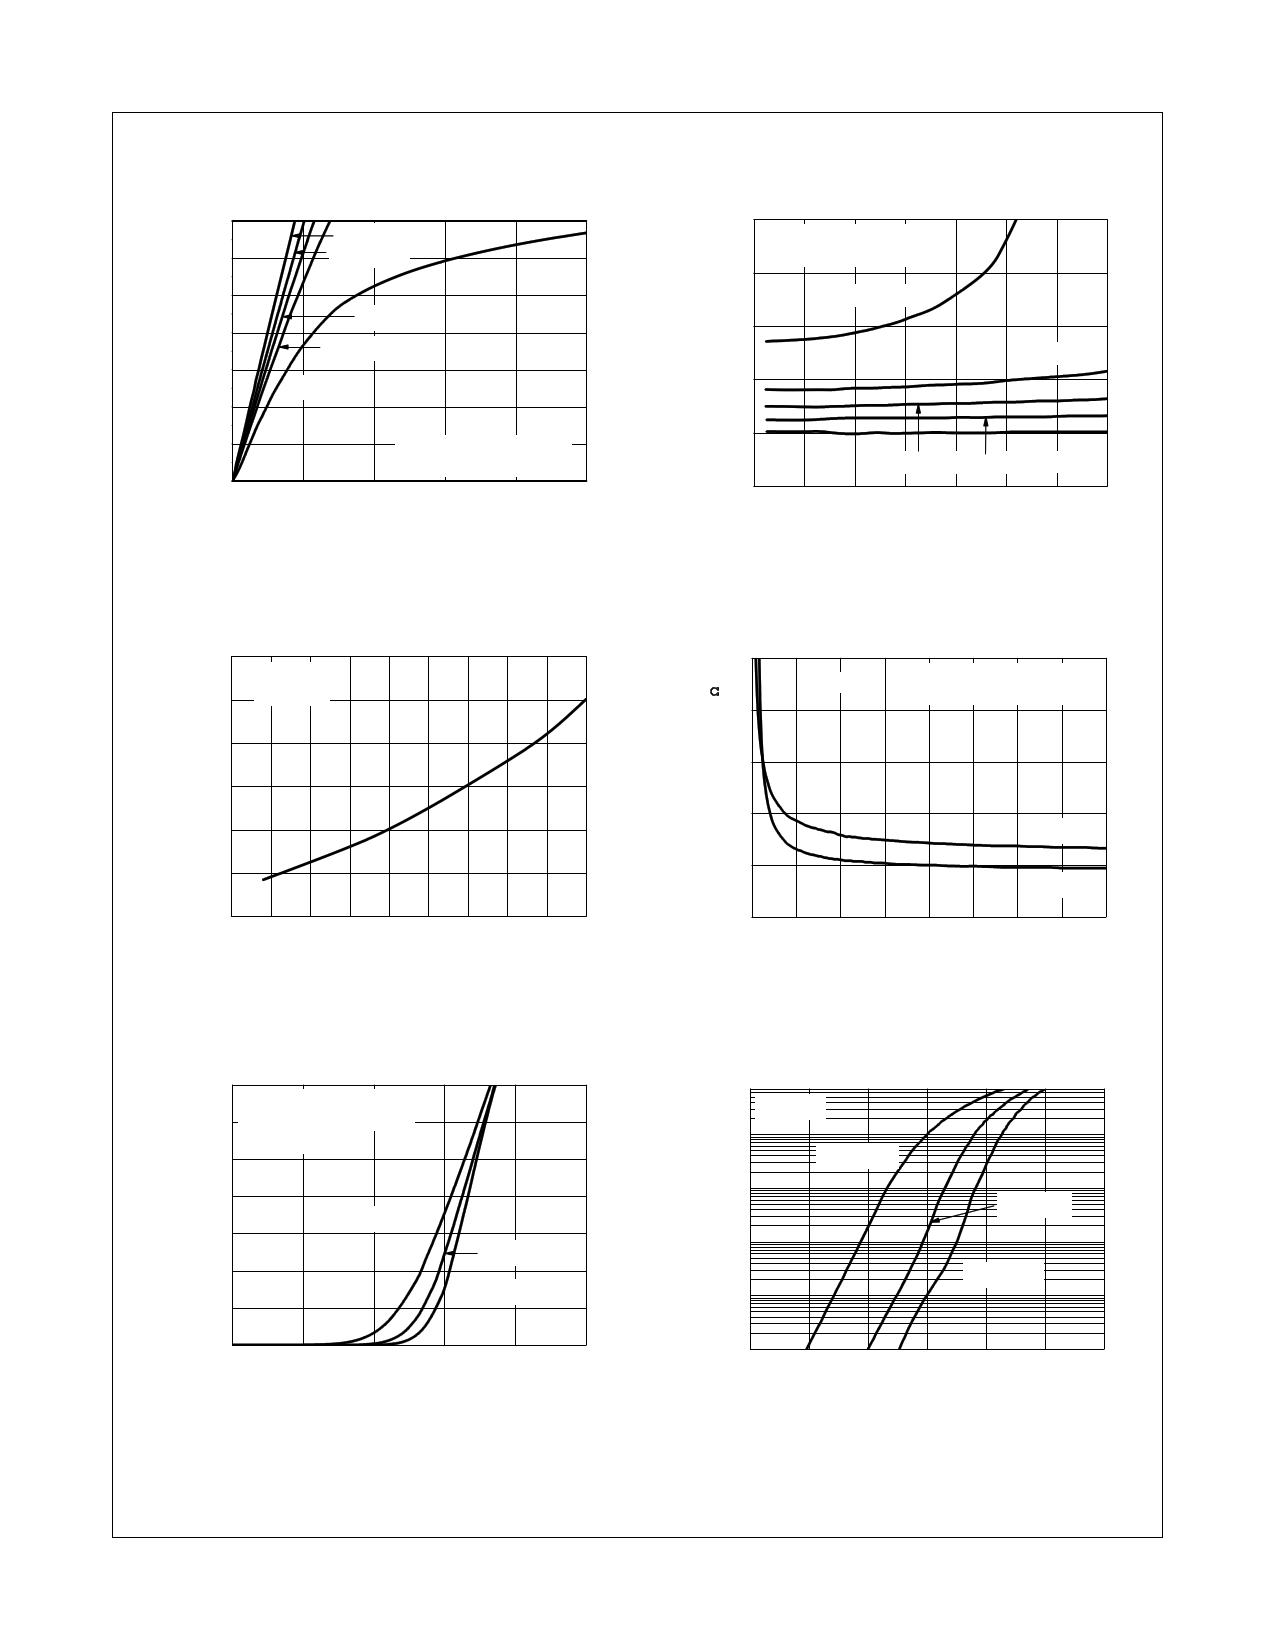 FDMS3610S pdf, 반도체, 판매, 대치품